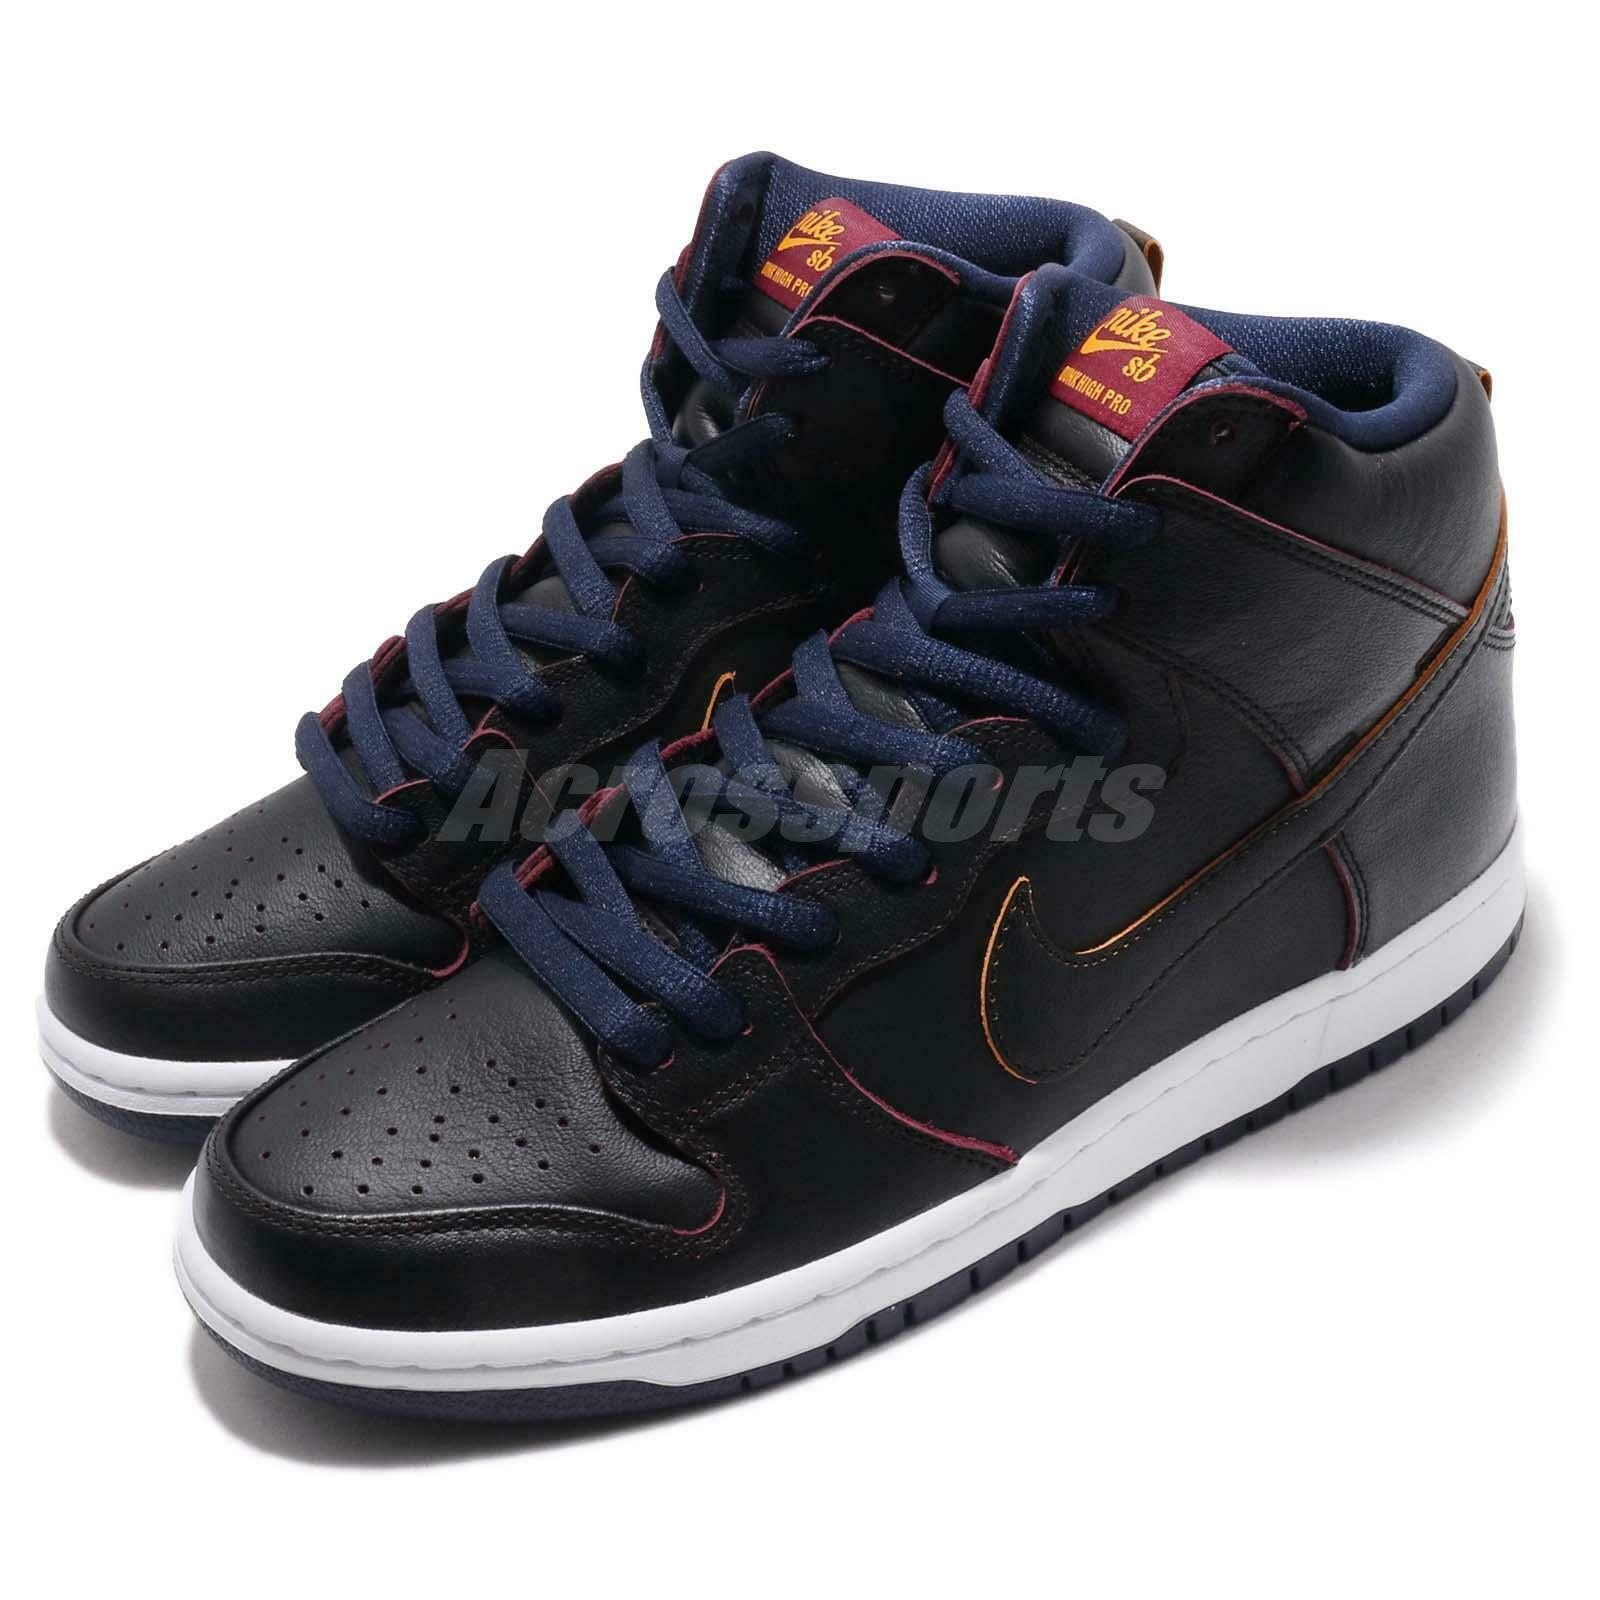 Nike SB Dunk High Pro Pro Pro NBA Cleveland Cavaliers nero Navy Cavs scarpe BQ6392-001 40799a